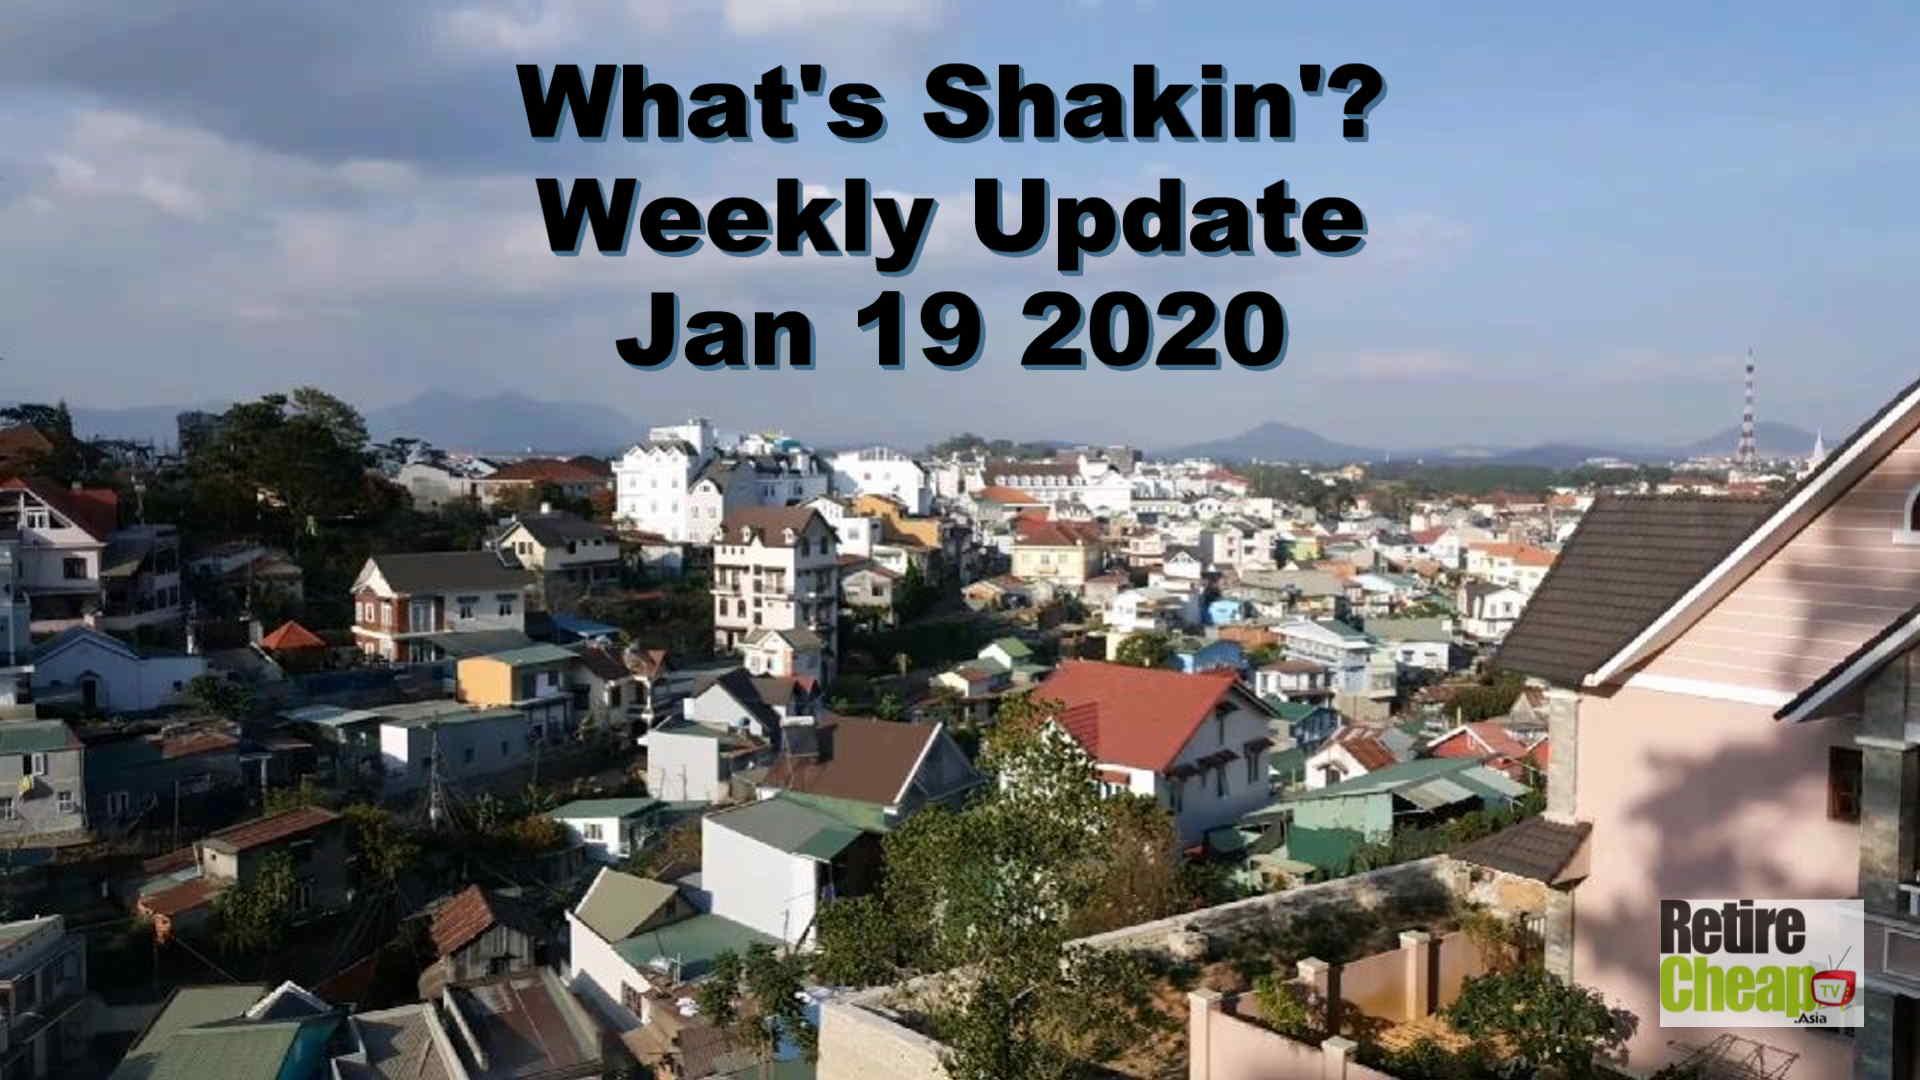 What's Shakn'? Week January 19 2020